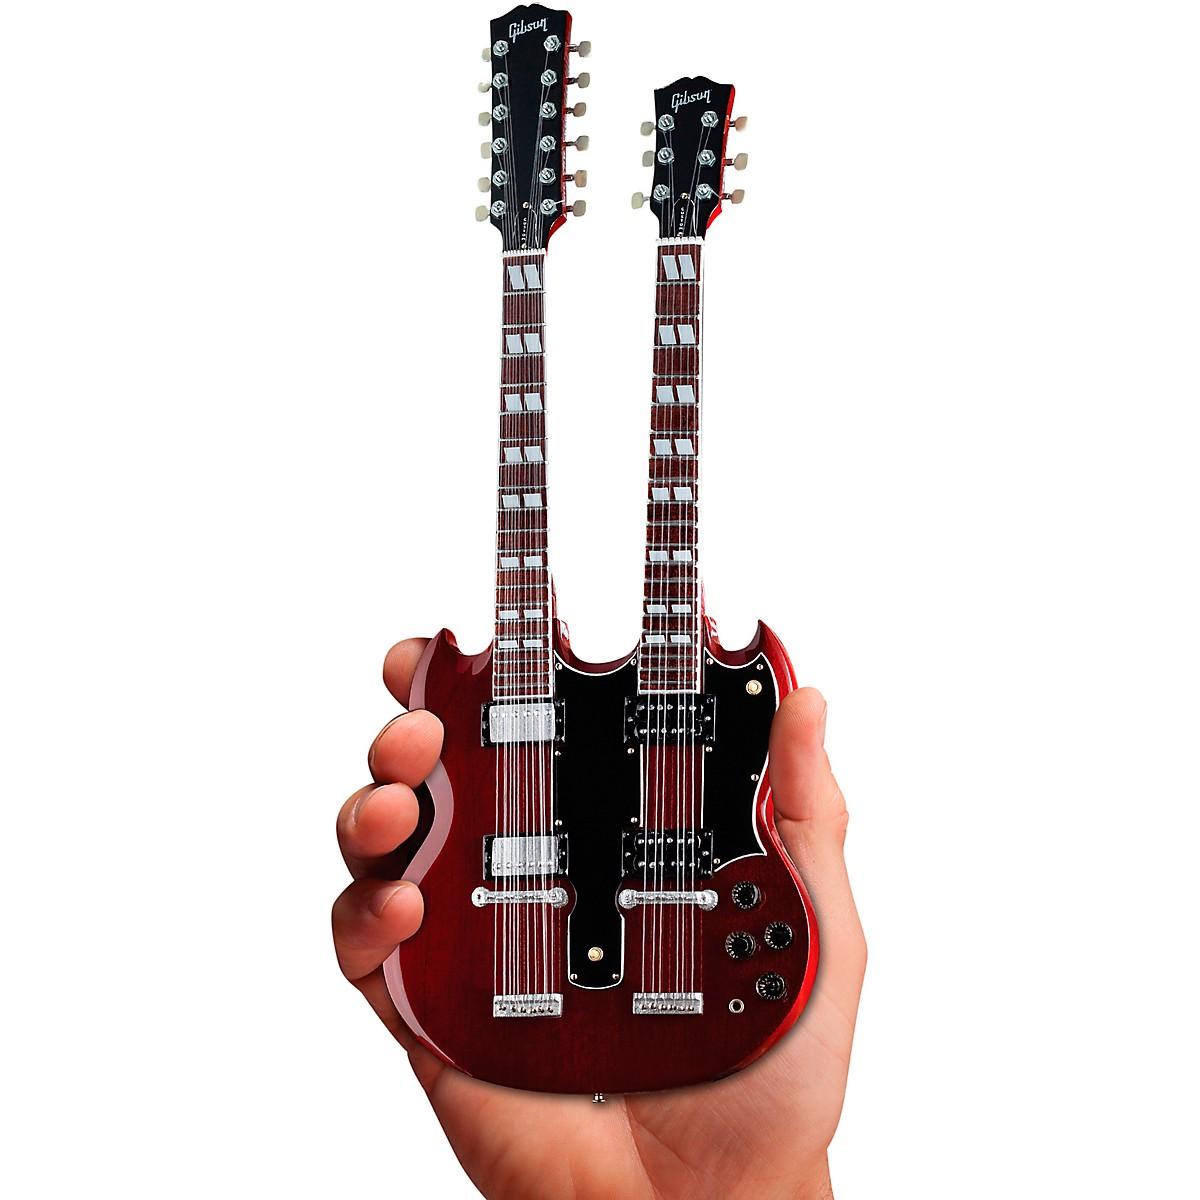 Axe Heaven Gibson SG EDS-1275 Doubleneck Cherry Officially Licensed Miniature Guitar Replica